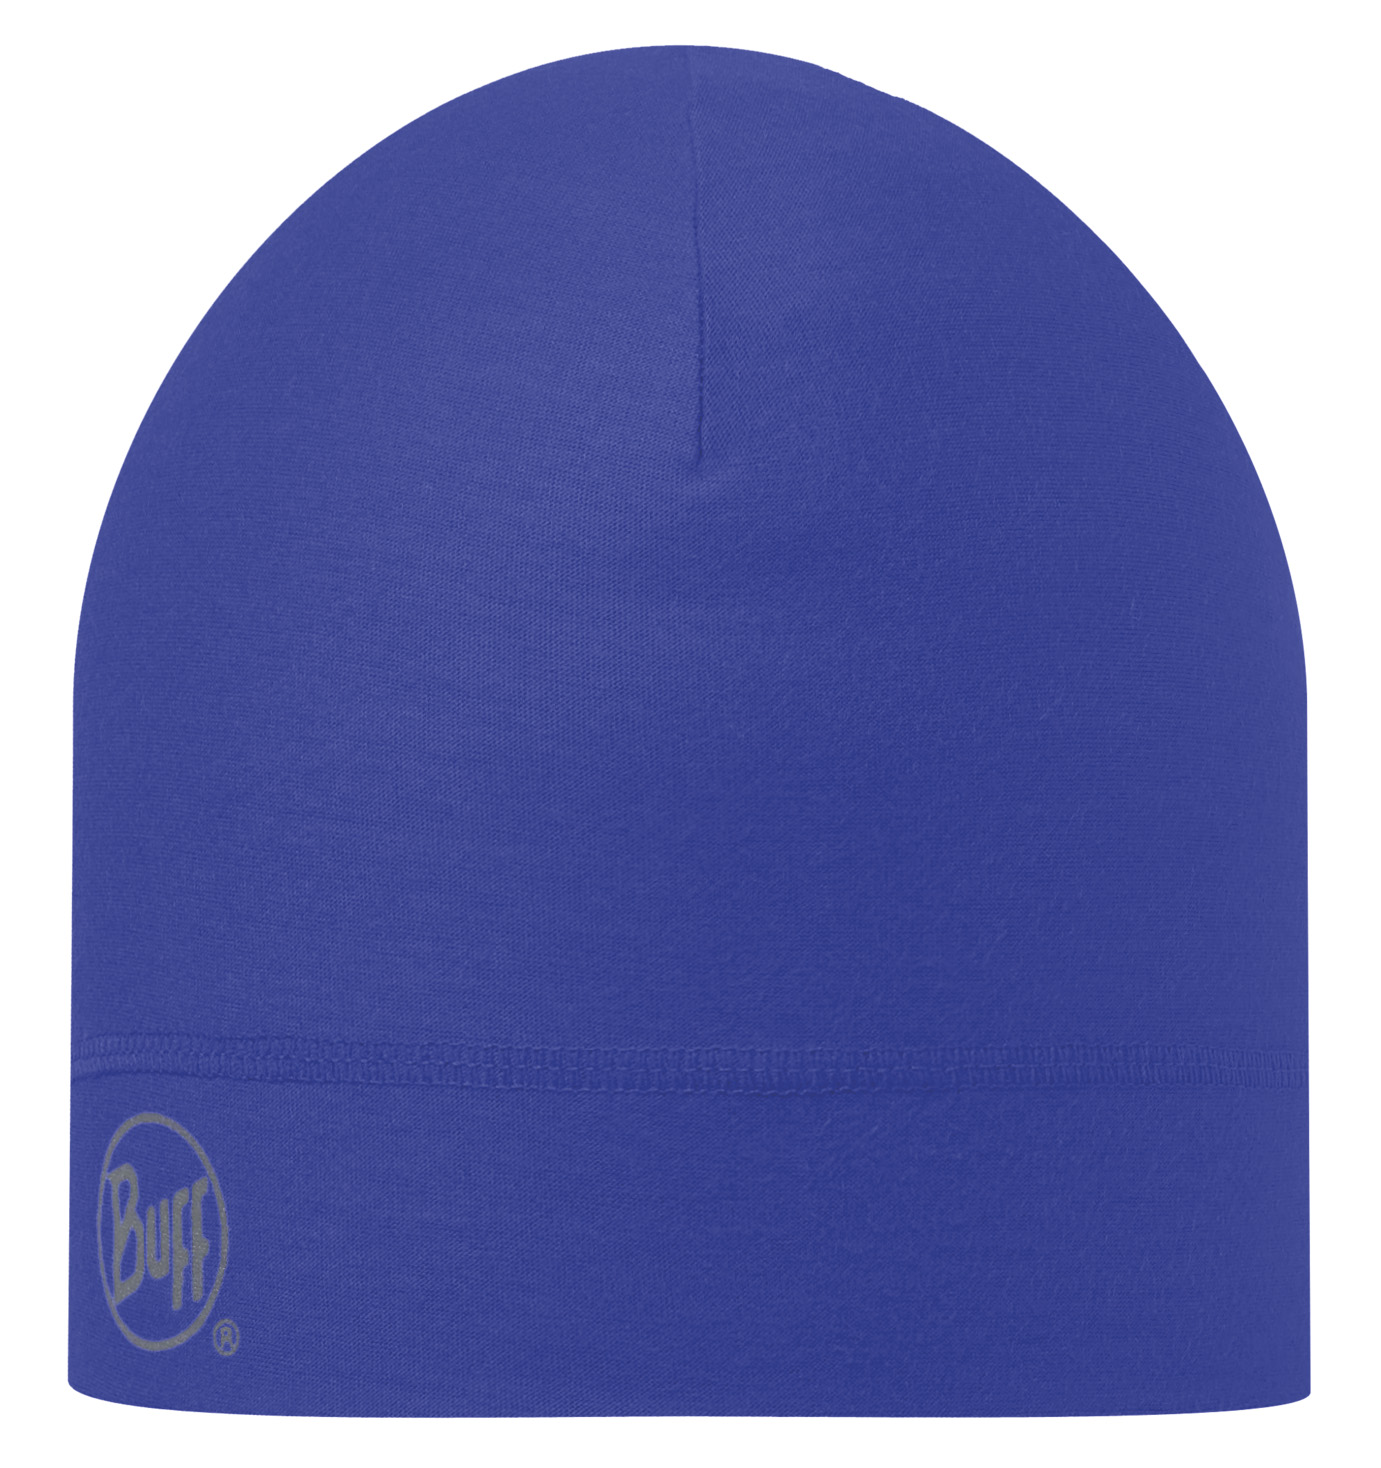 Купить Шапка BUFF Coolmax COOLMAX 1 LAYER HAT SOLID BLUE INK Банданы и шарфы Buff ® 1185651